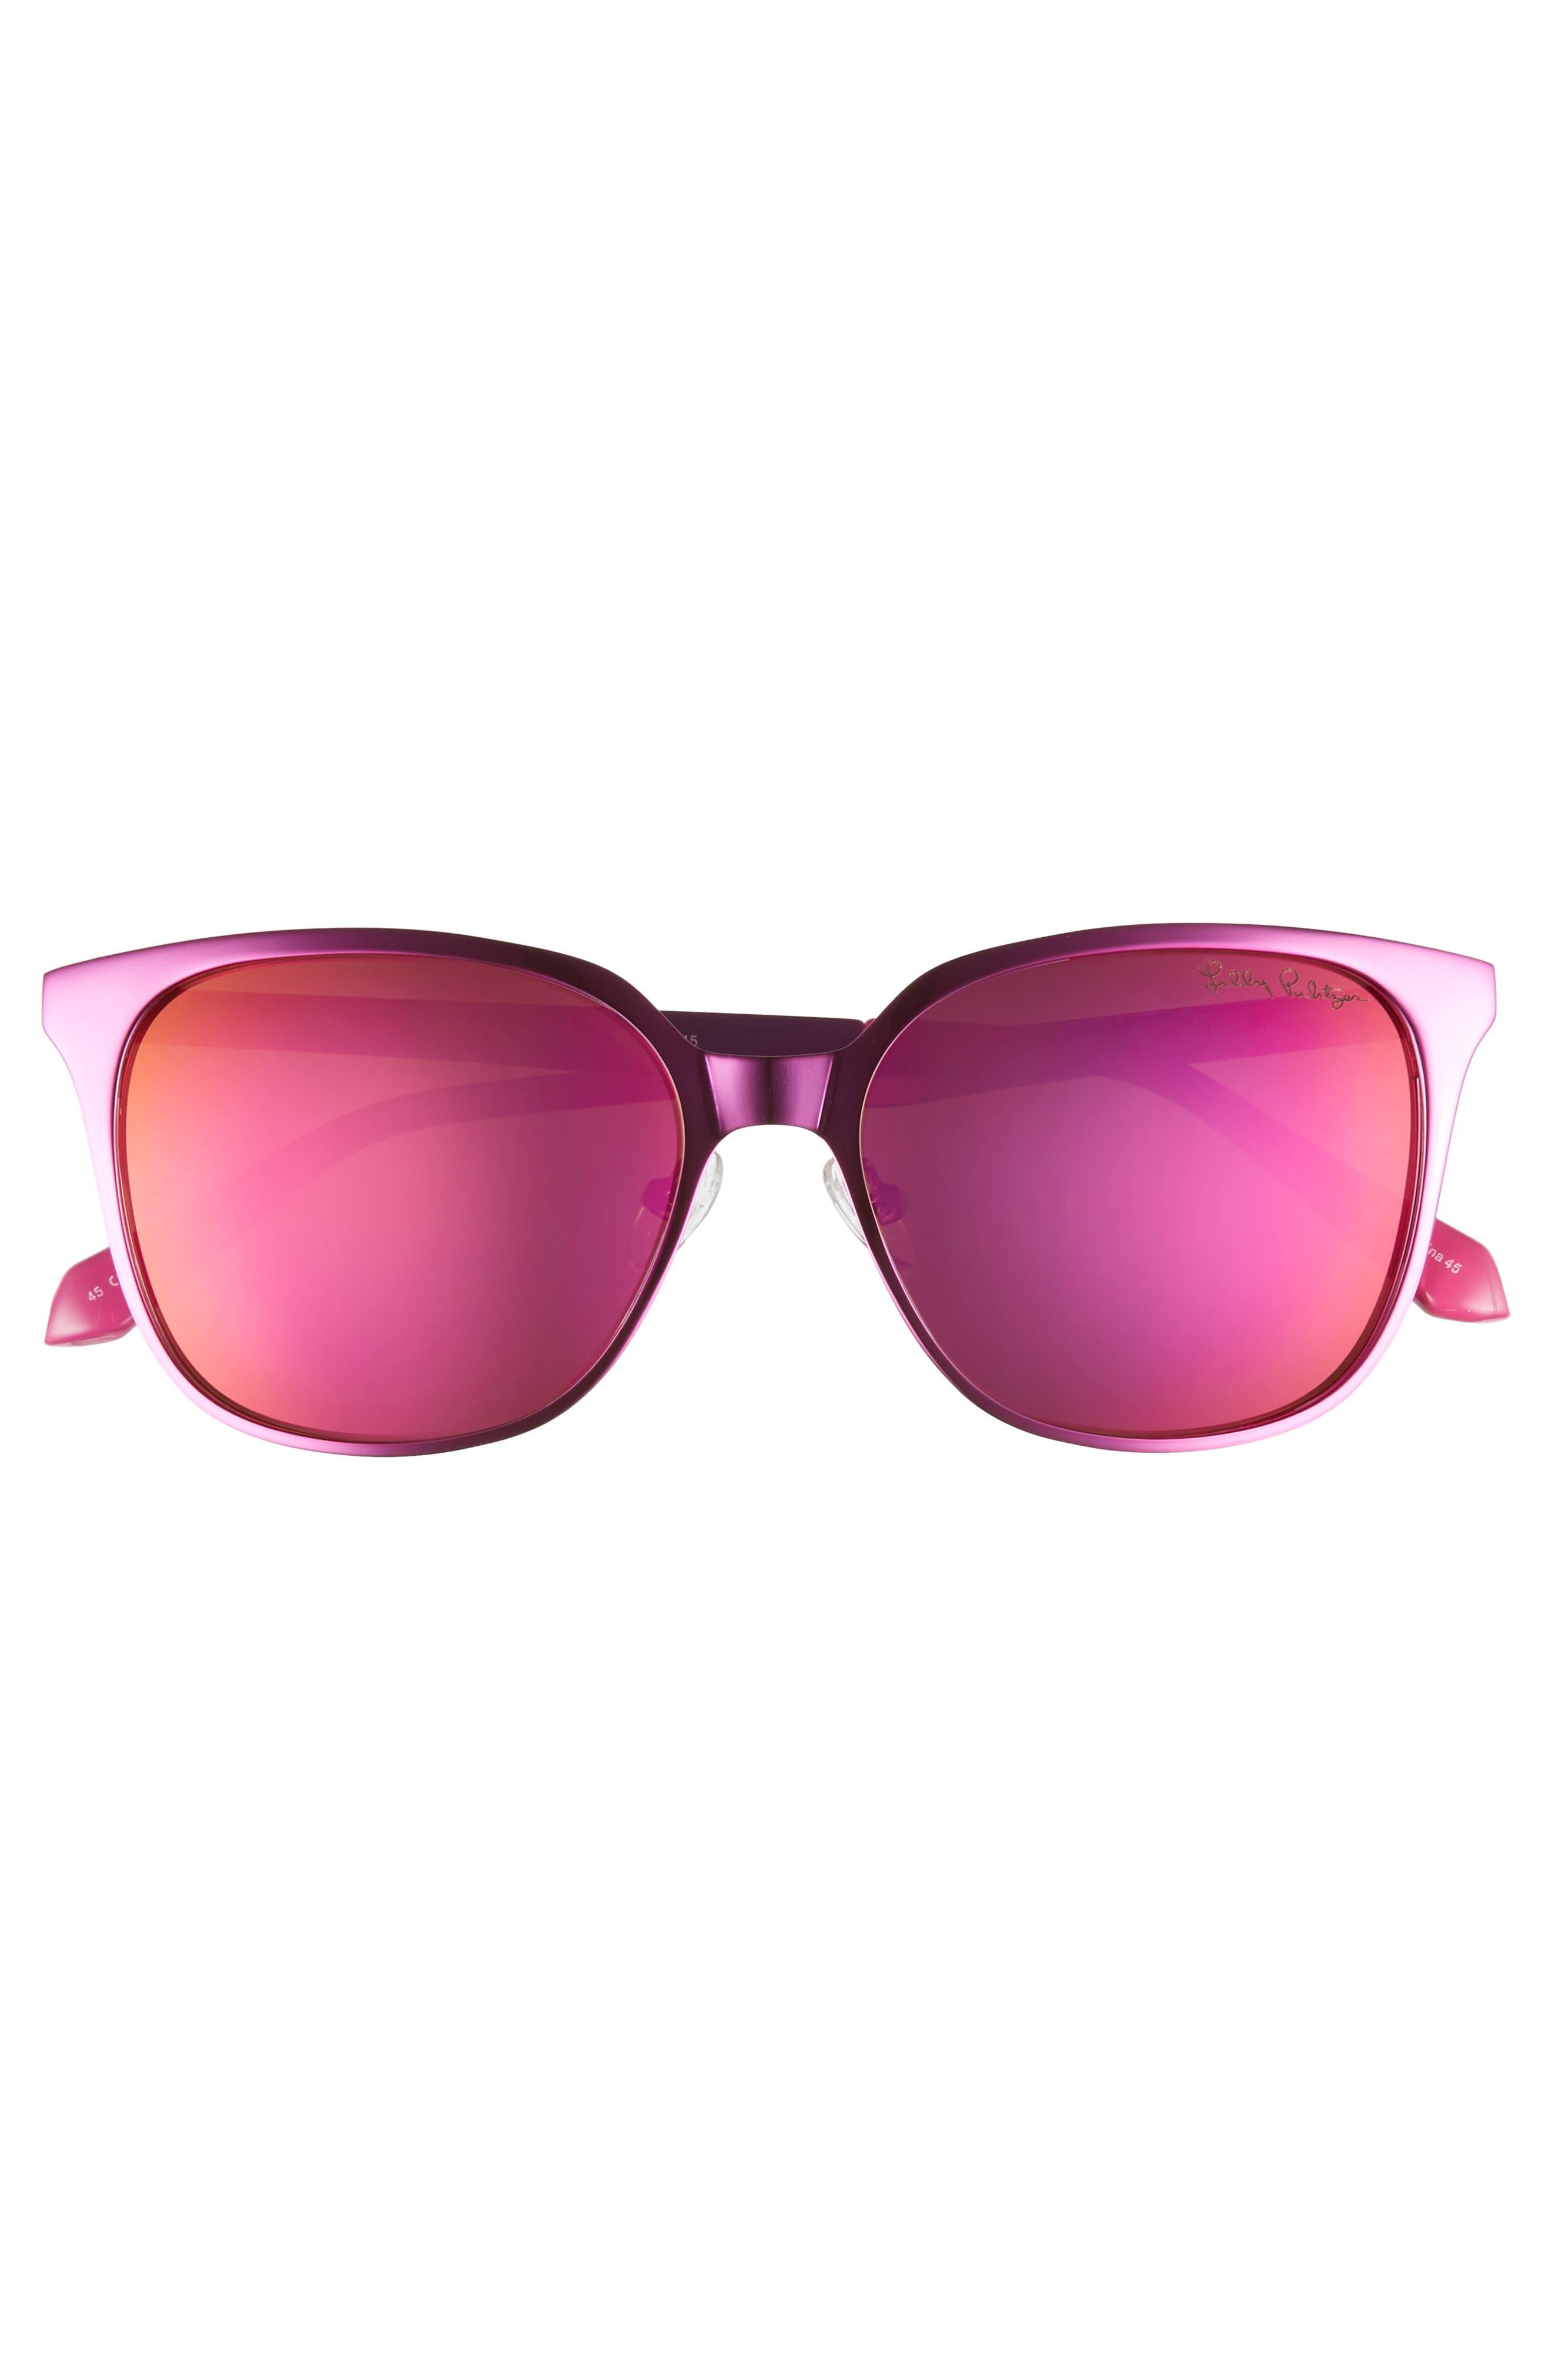 Landon 54mm Polarized Sunglasses,                             Alternate thumbnail 3, color,                             PINK/ PINK